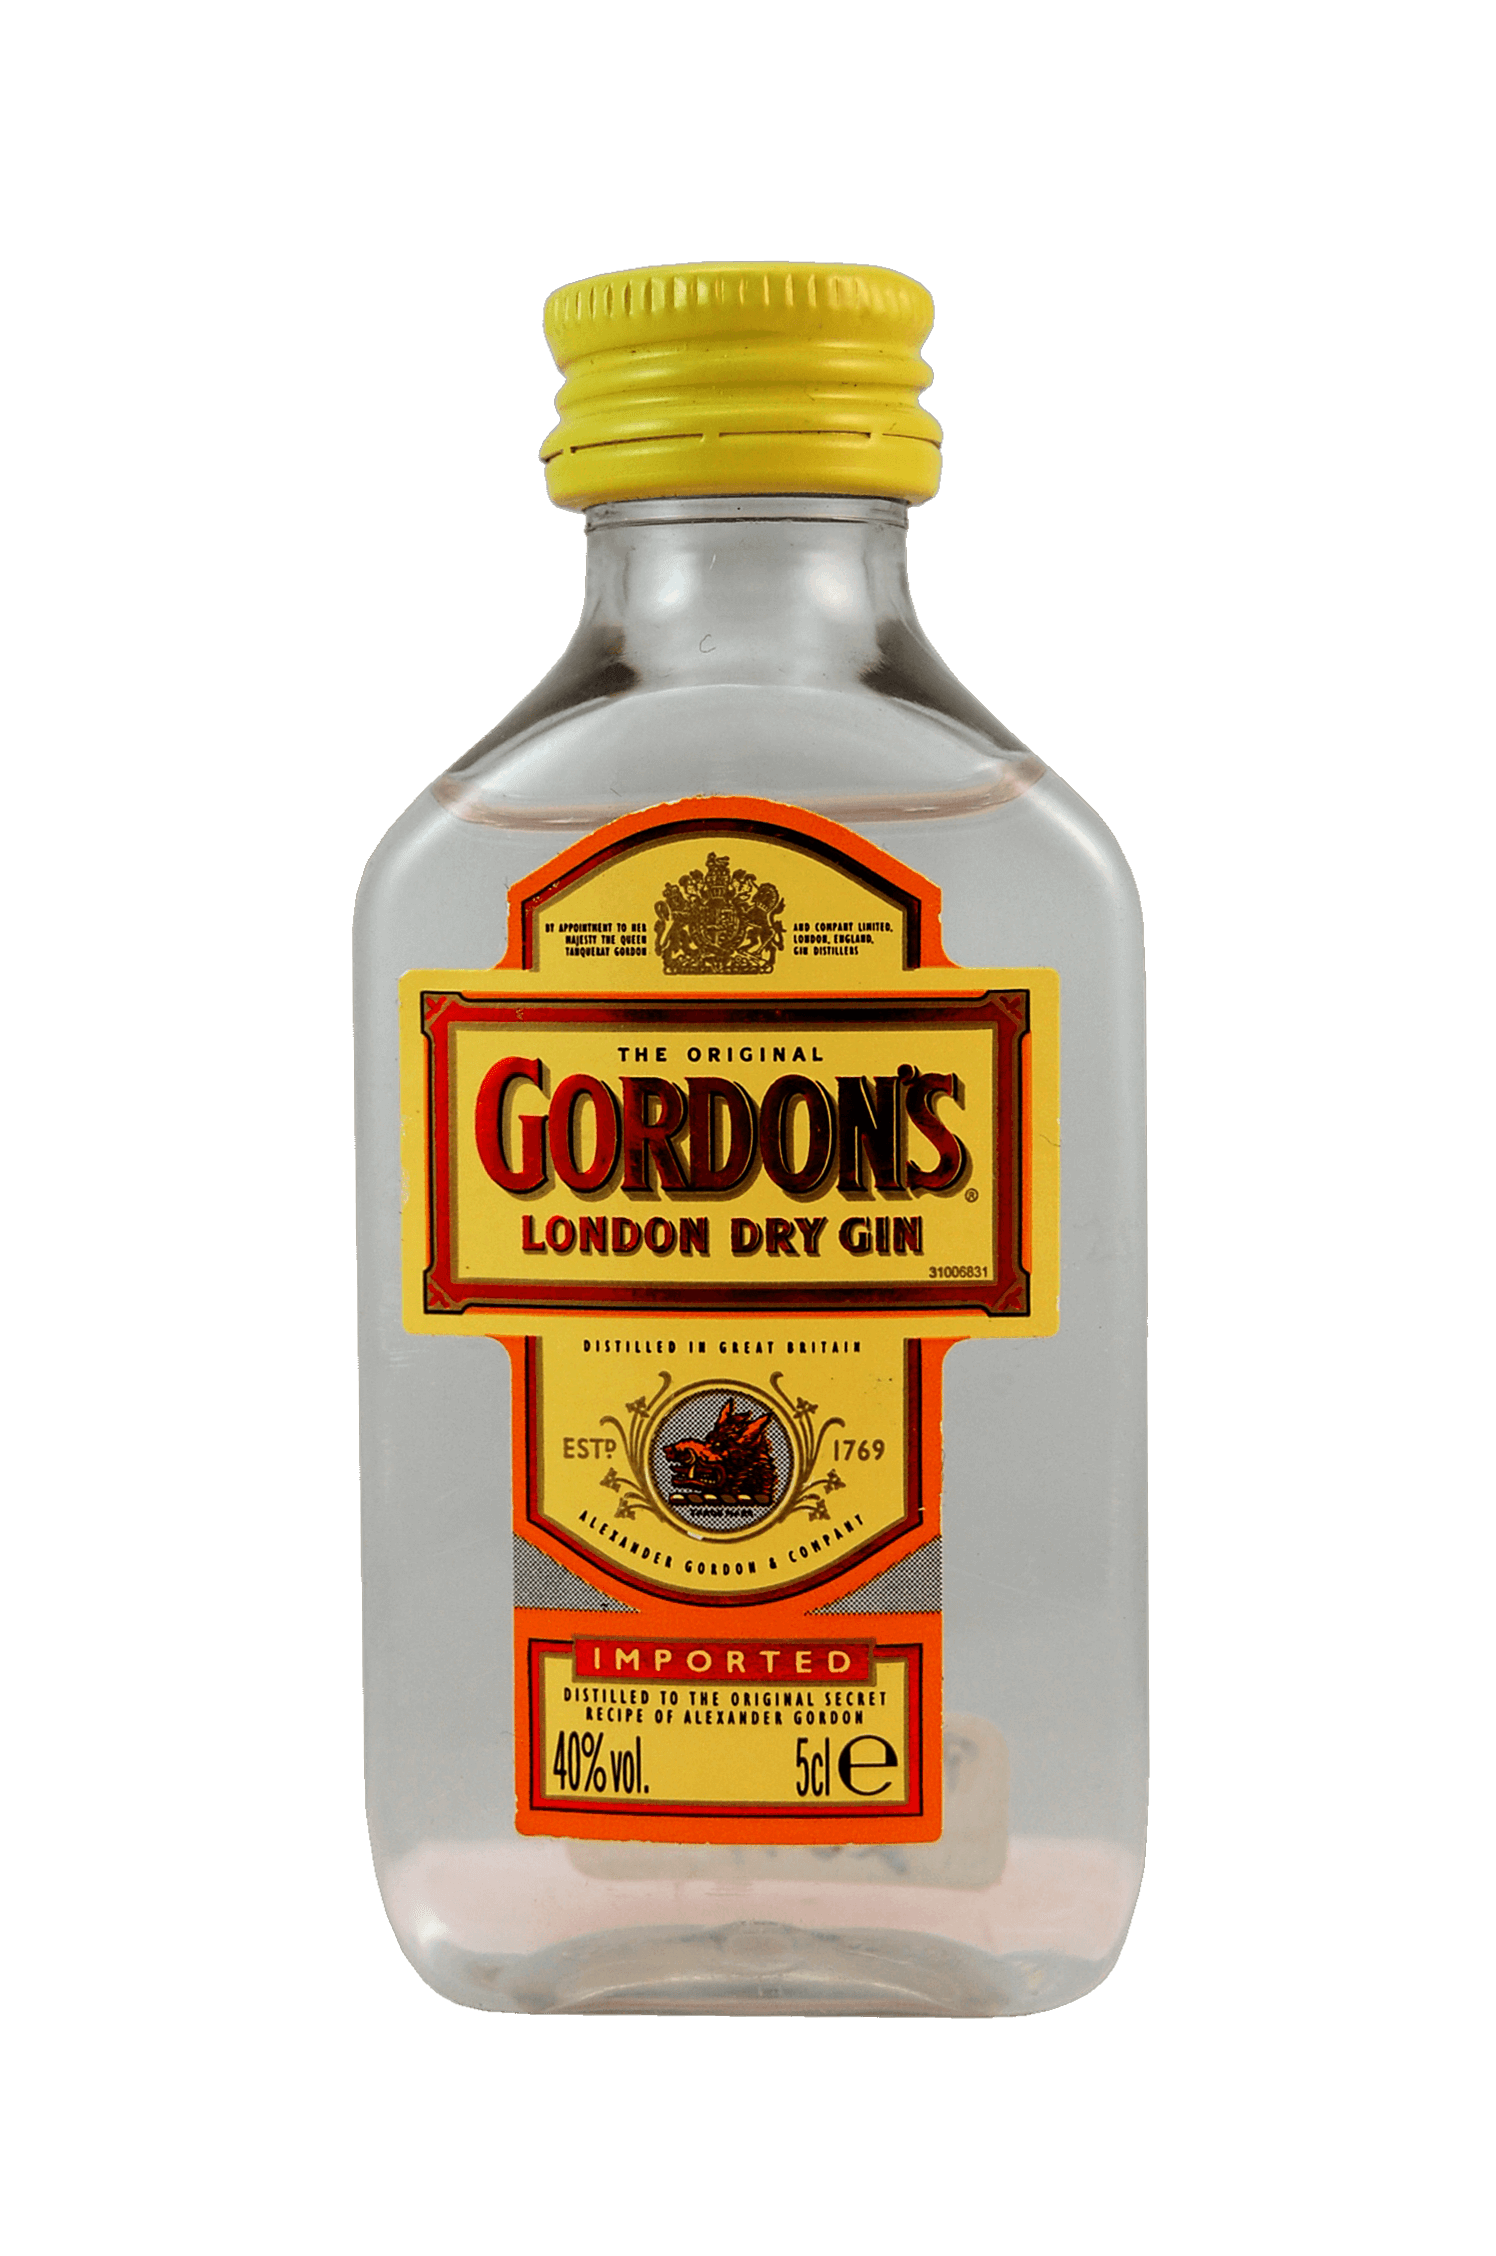 Corgons London Dry Gin